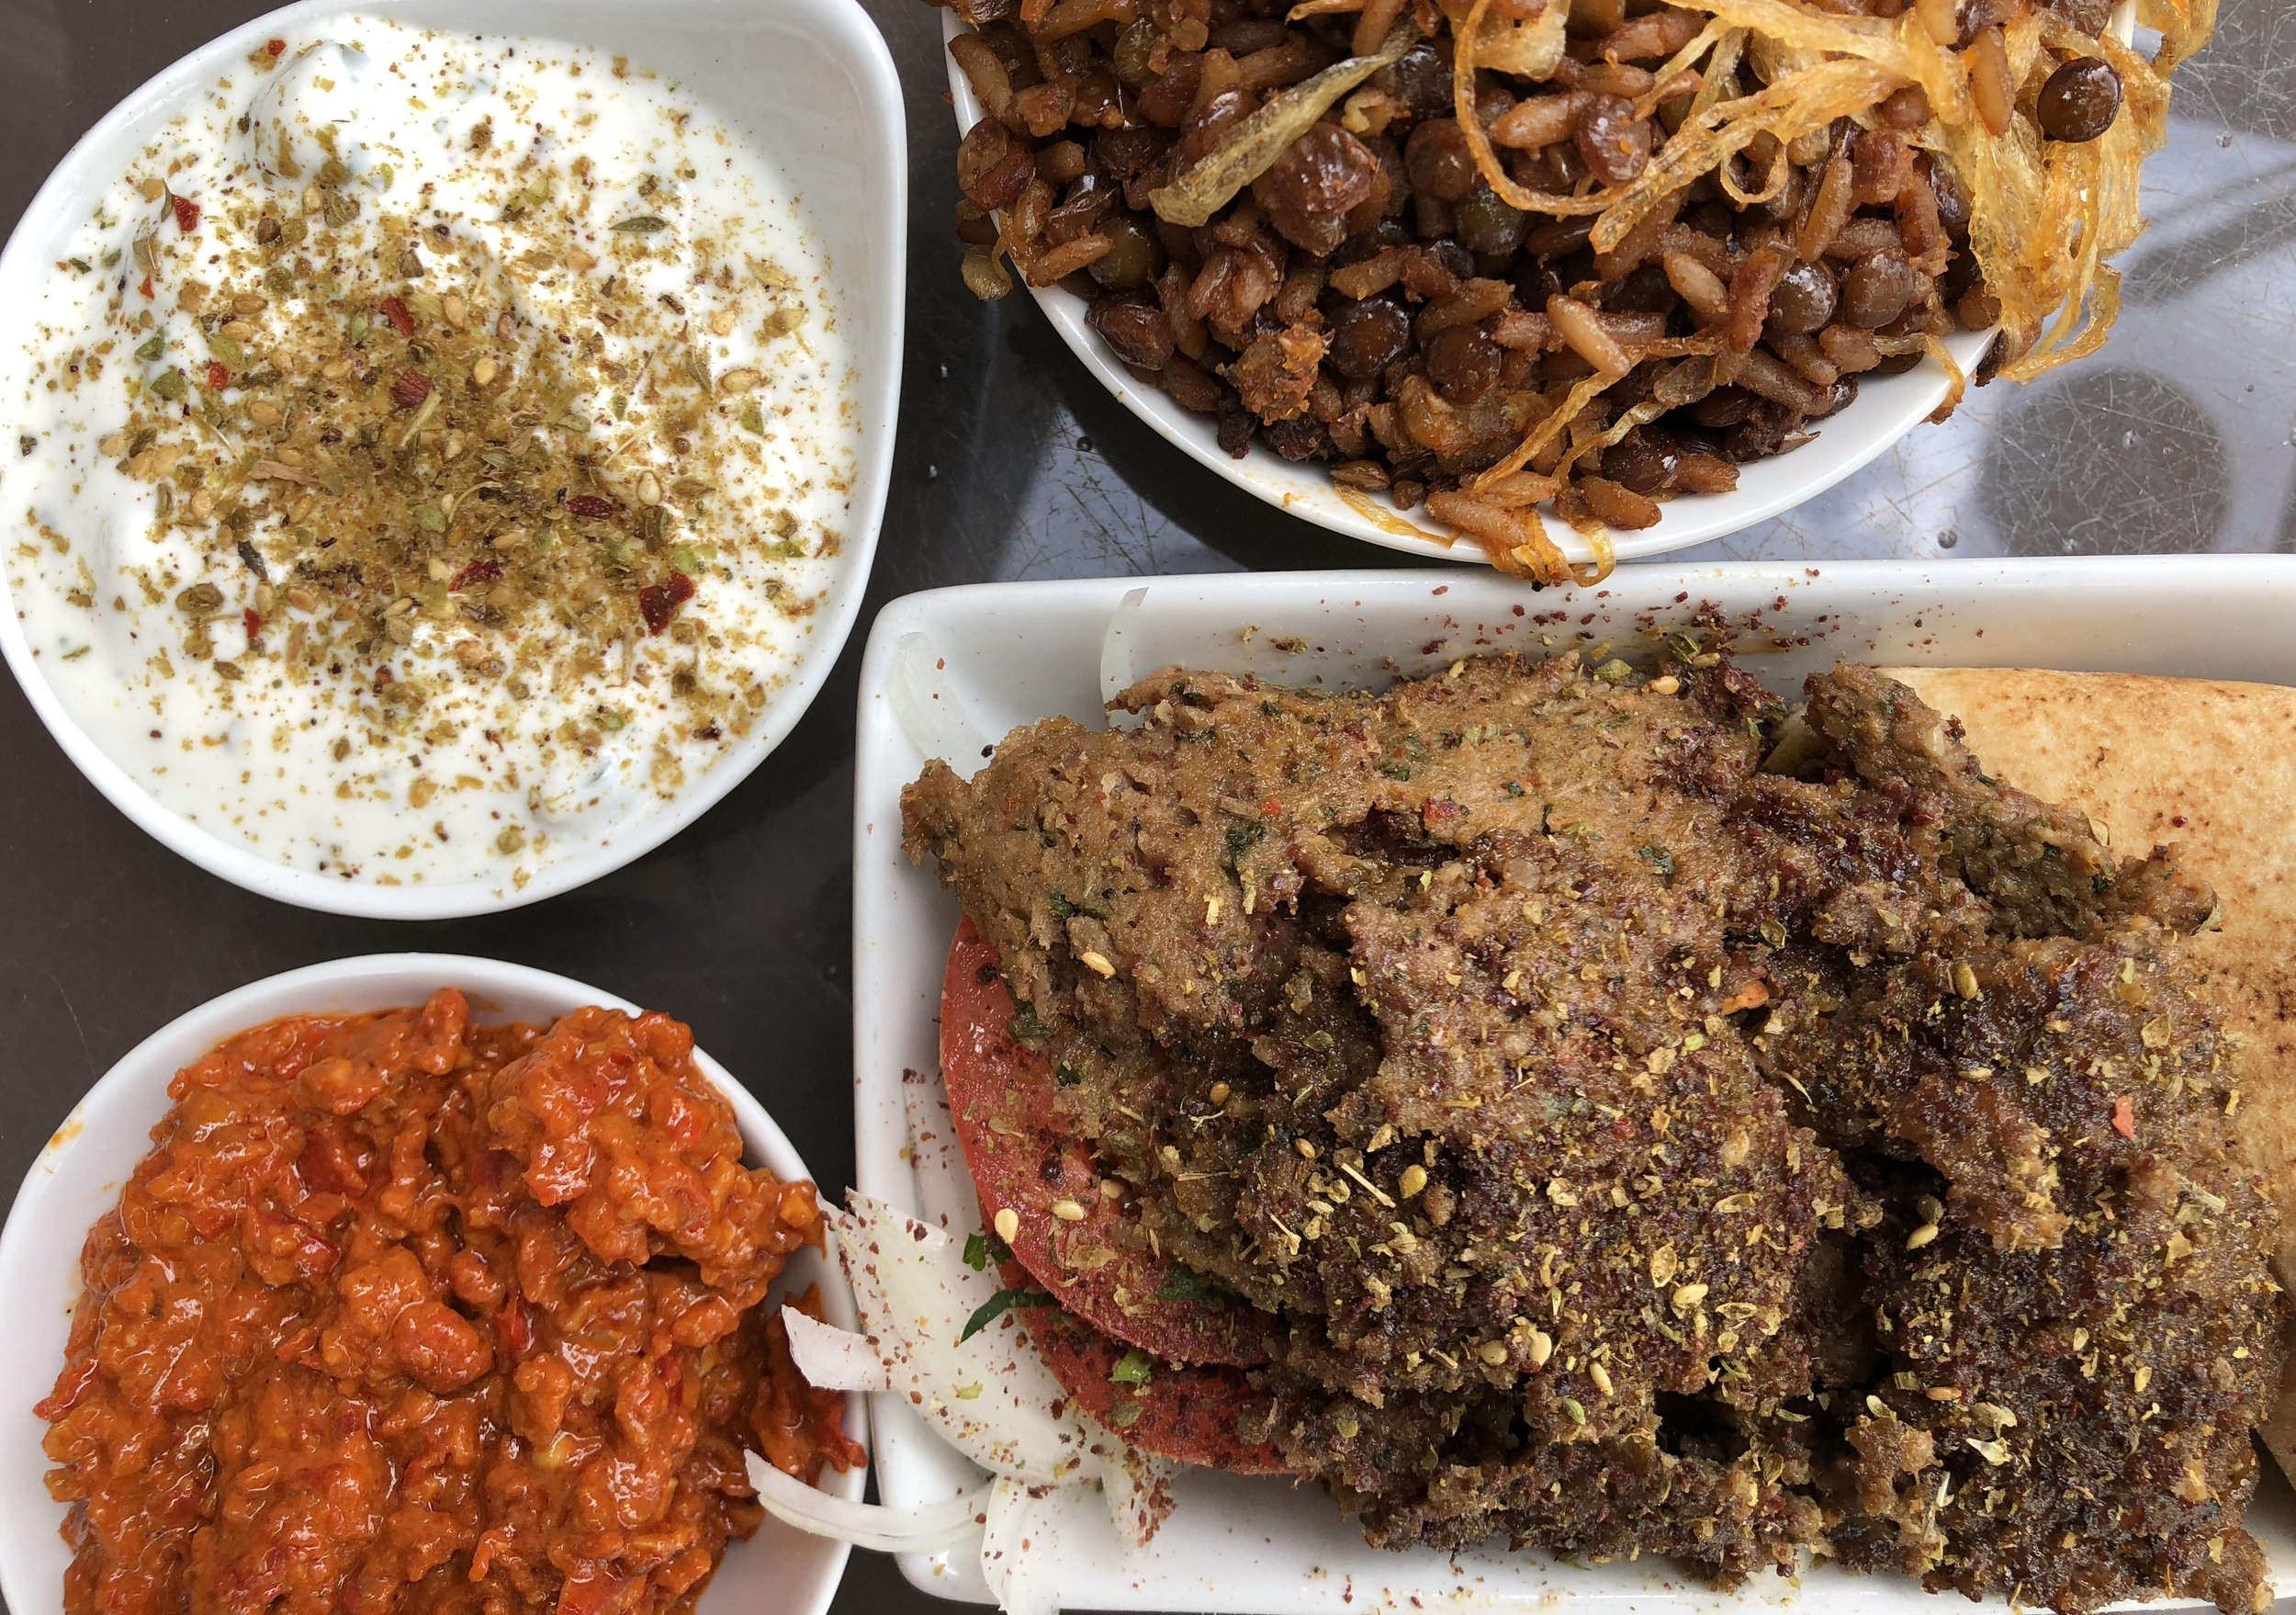 Phoenicia: A Museum of Food — Terabeza